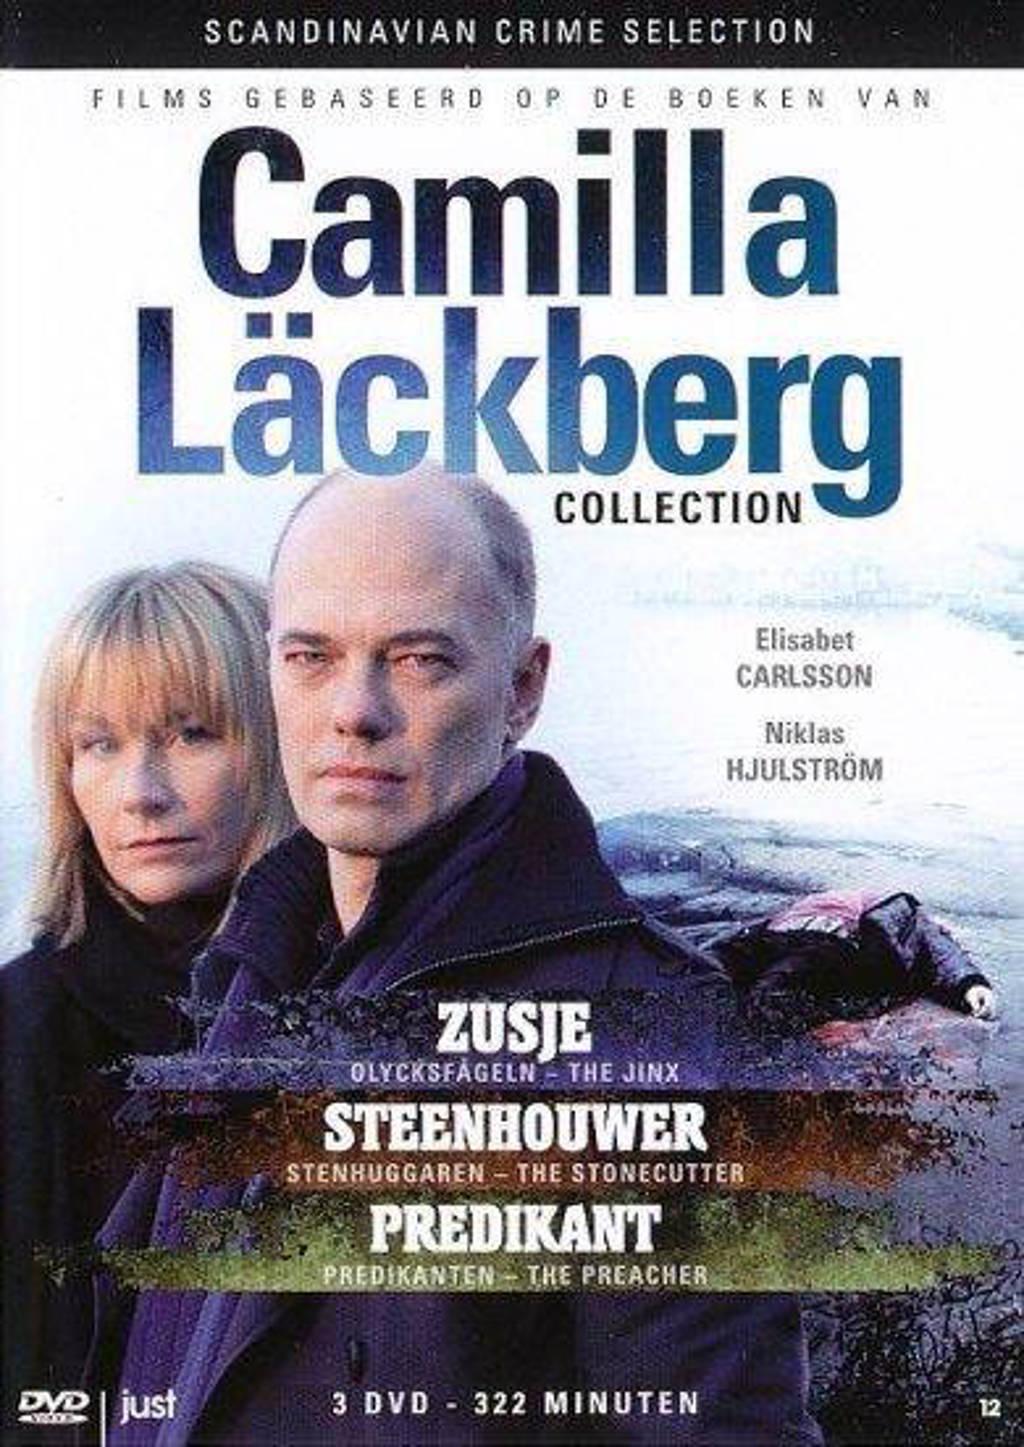 Camilla Läckberg collection (DVD)